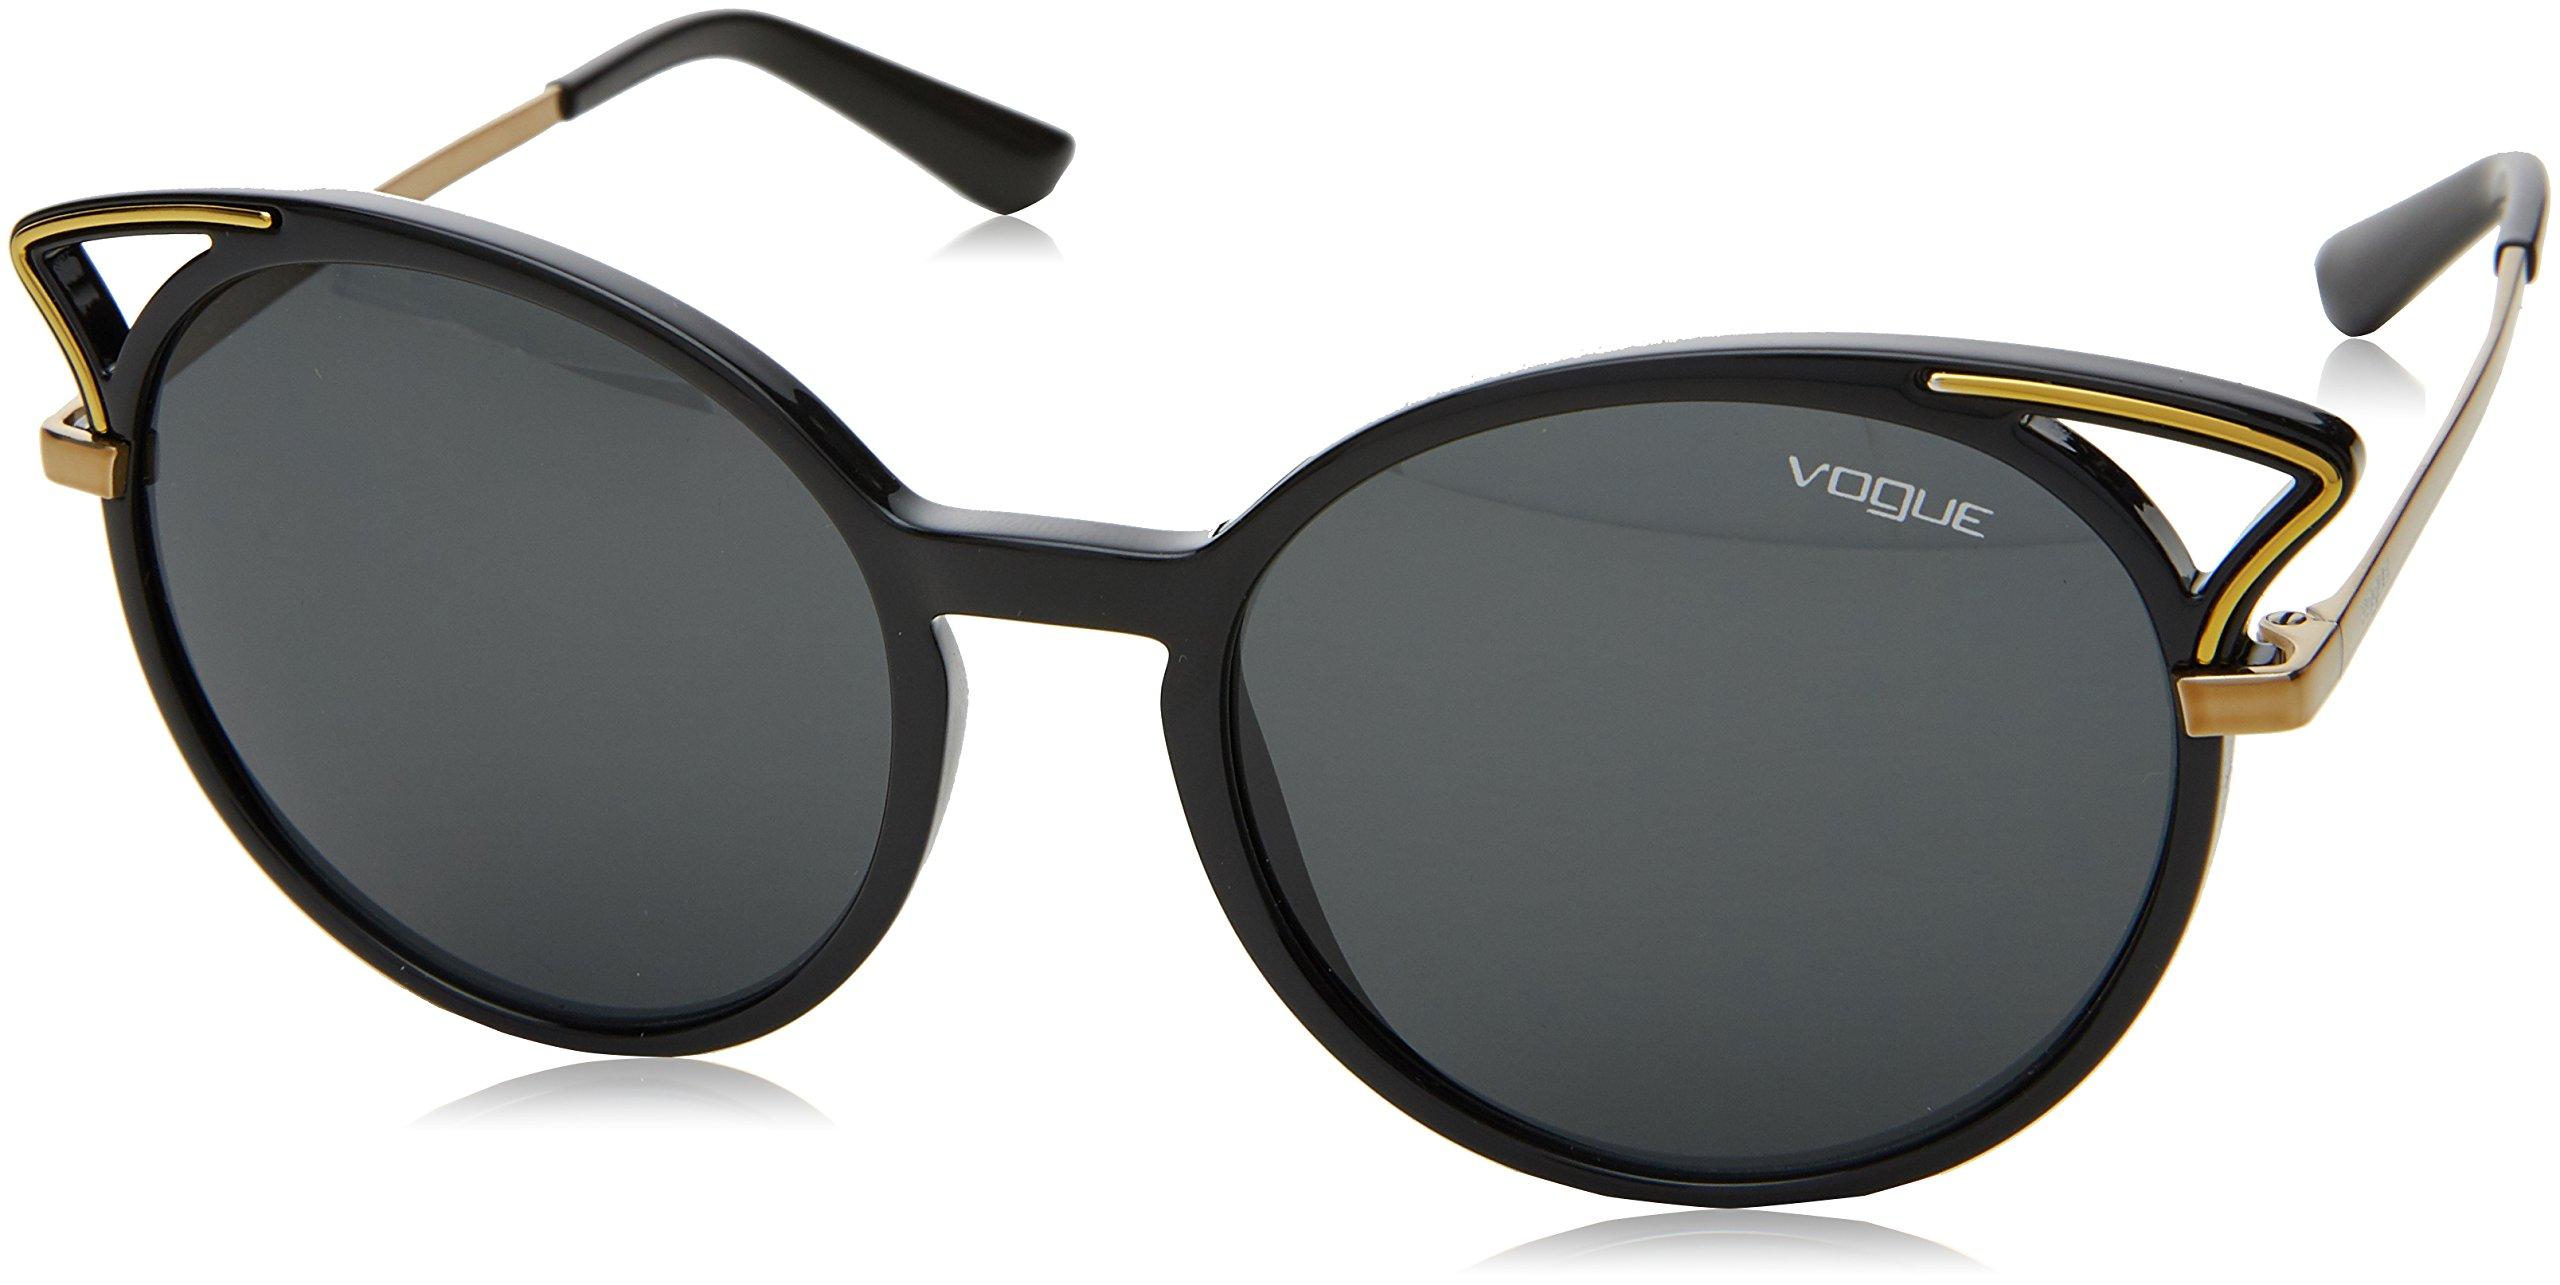 Ray-Ban Women's Plastic Woman Round Sunglasses, Black, 52 mm